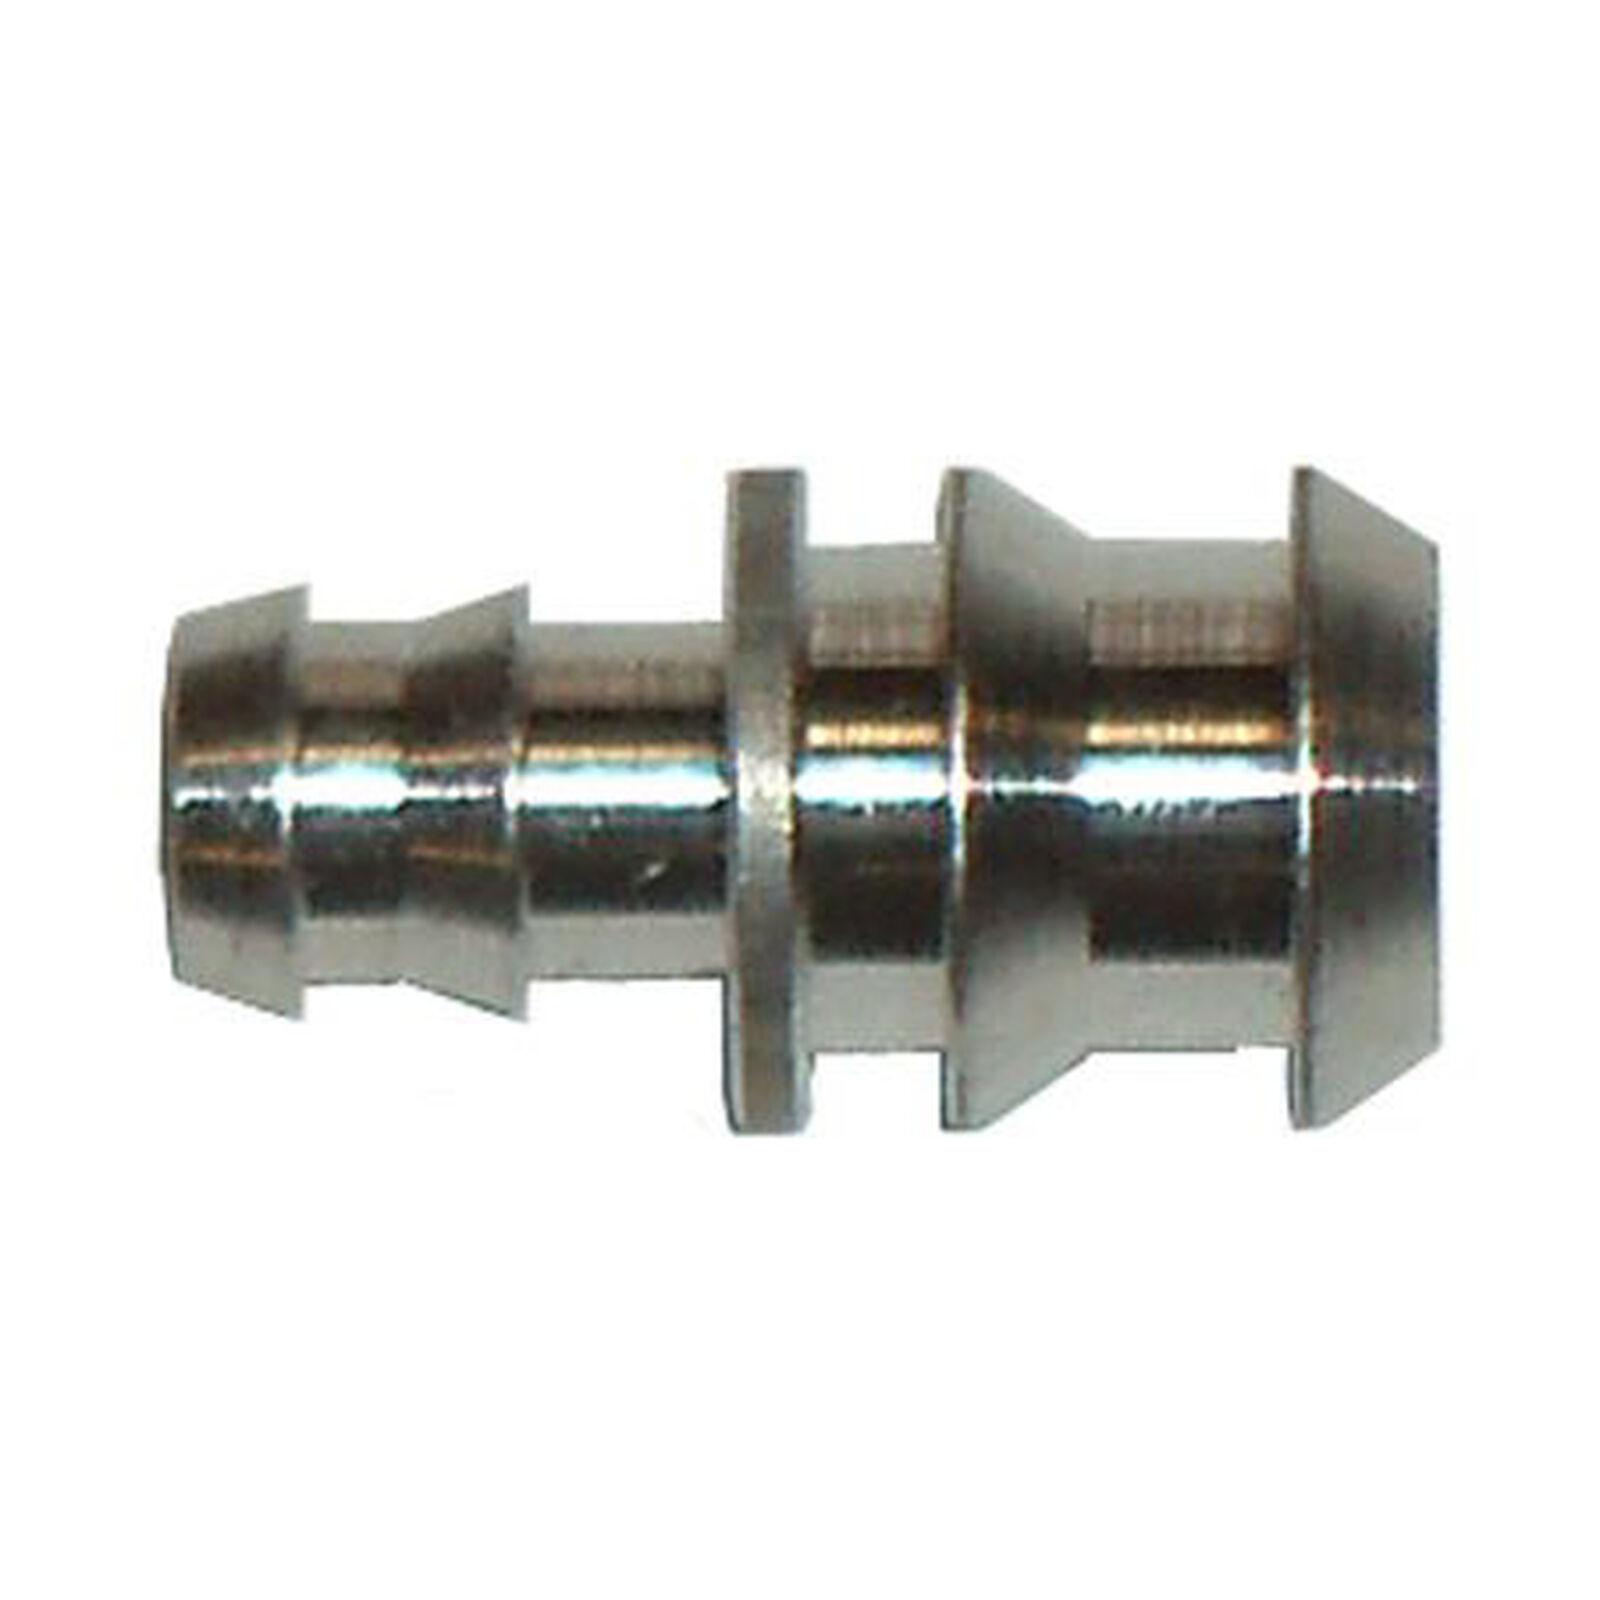 "Fuel Tubing Adapter, 3/32-5/32"""